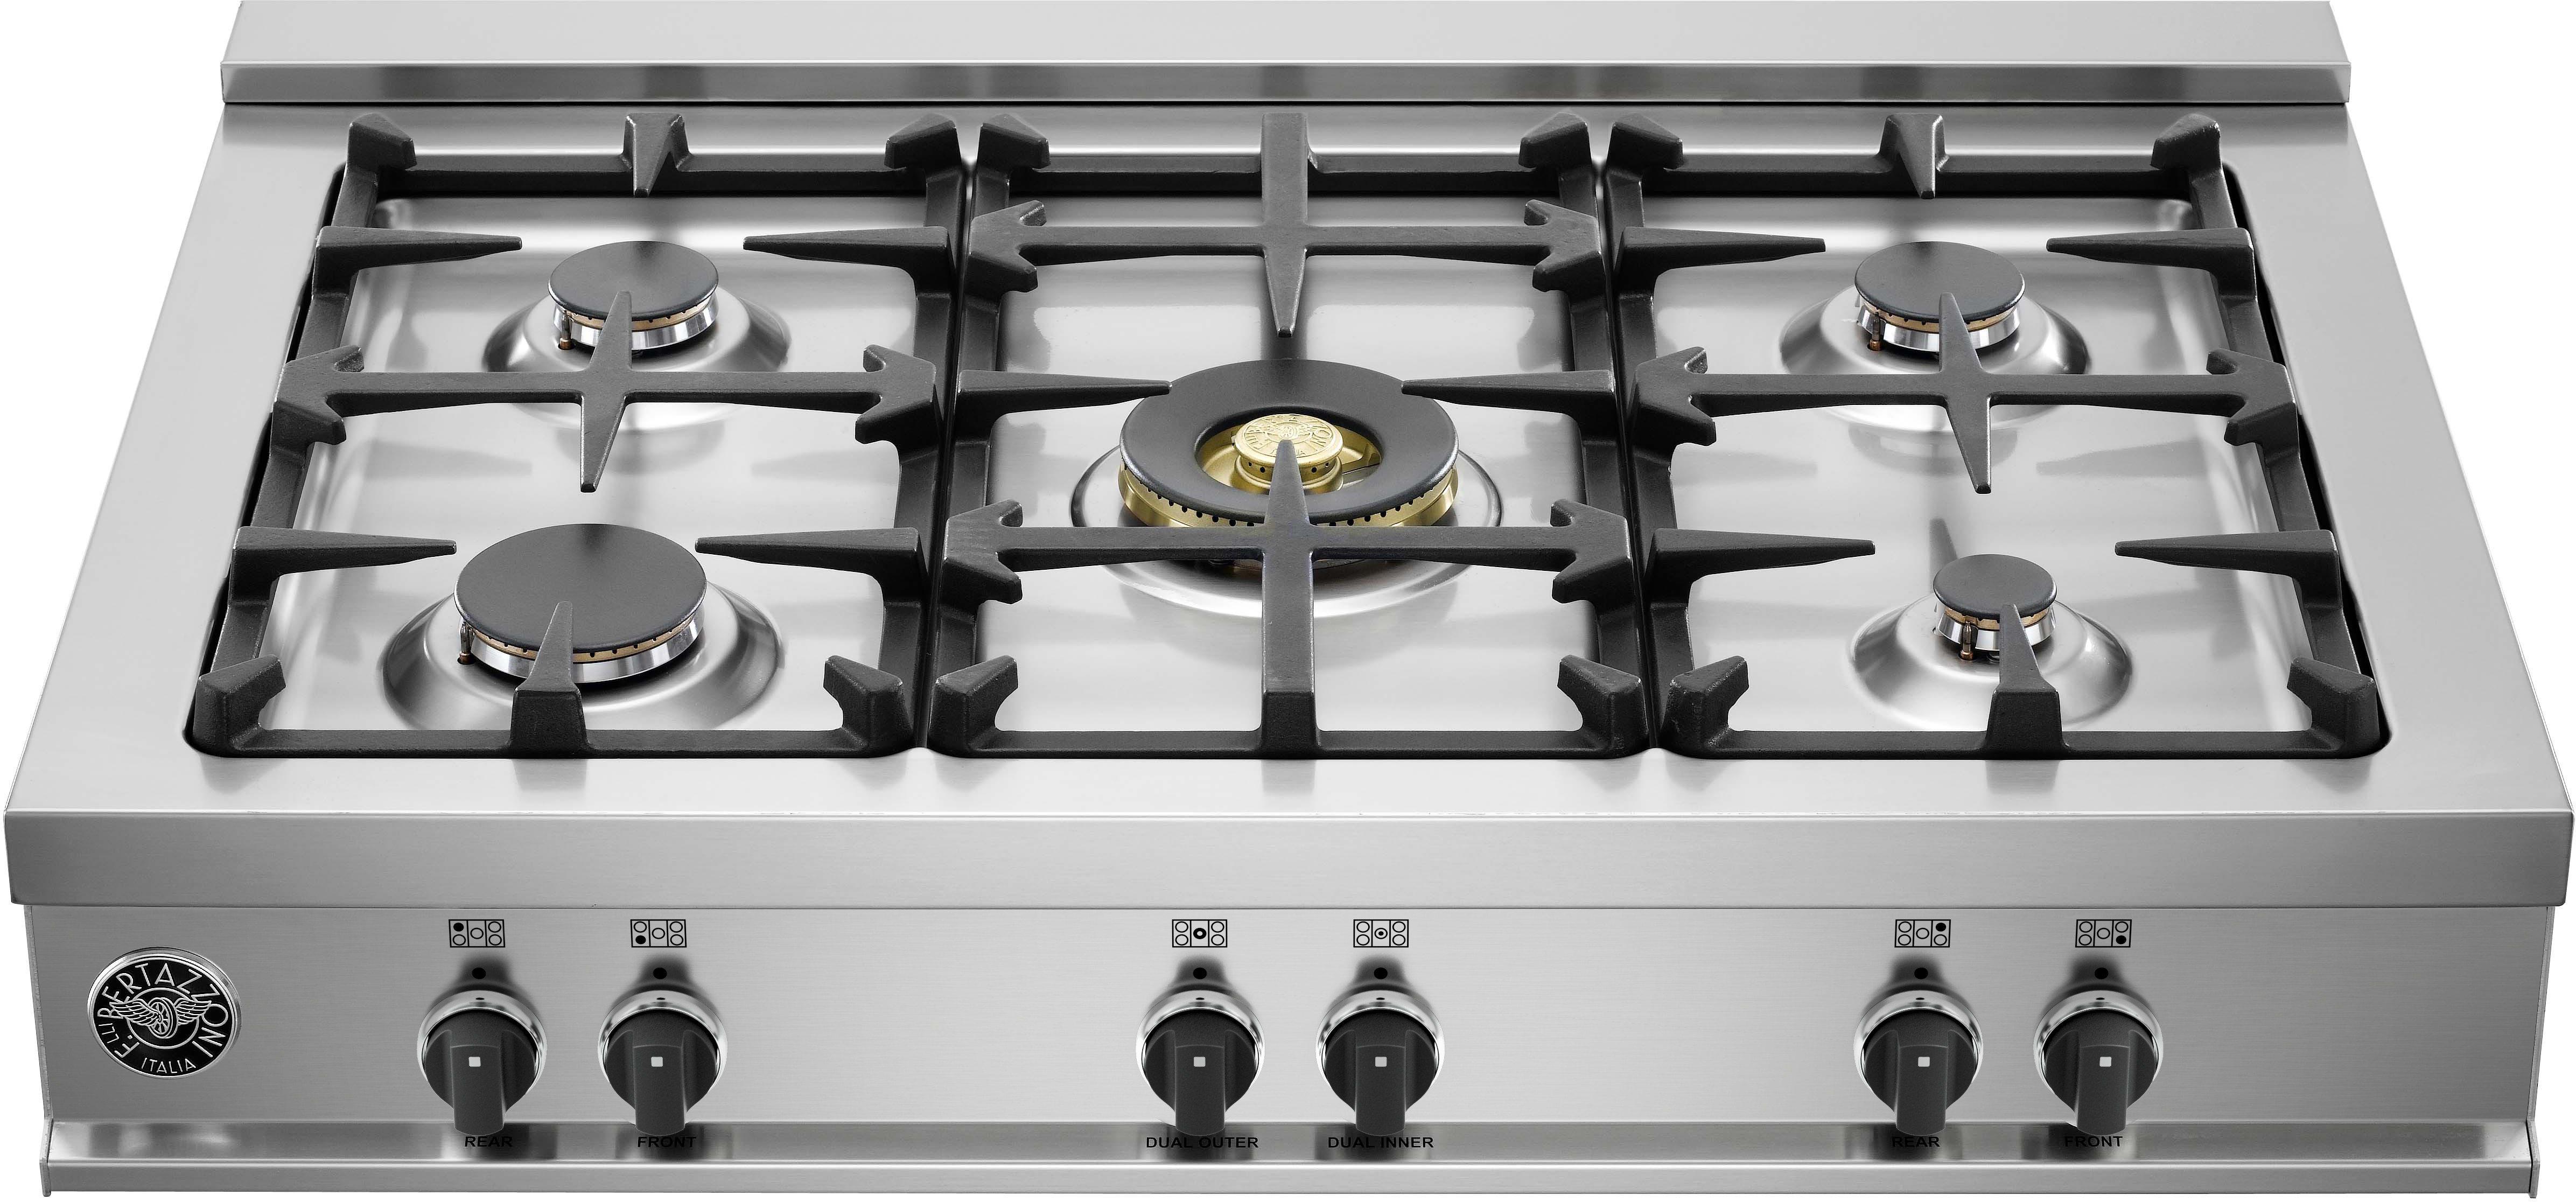 bertazzoni cb36m500x 36 inch gas rangetop with 5 sealed burn